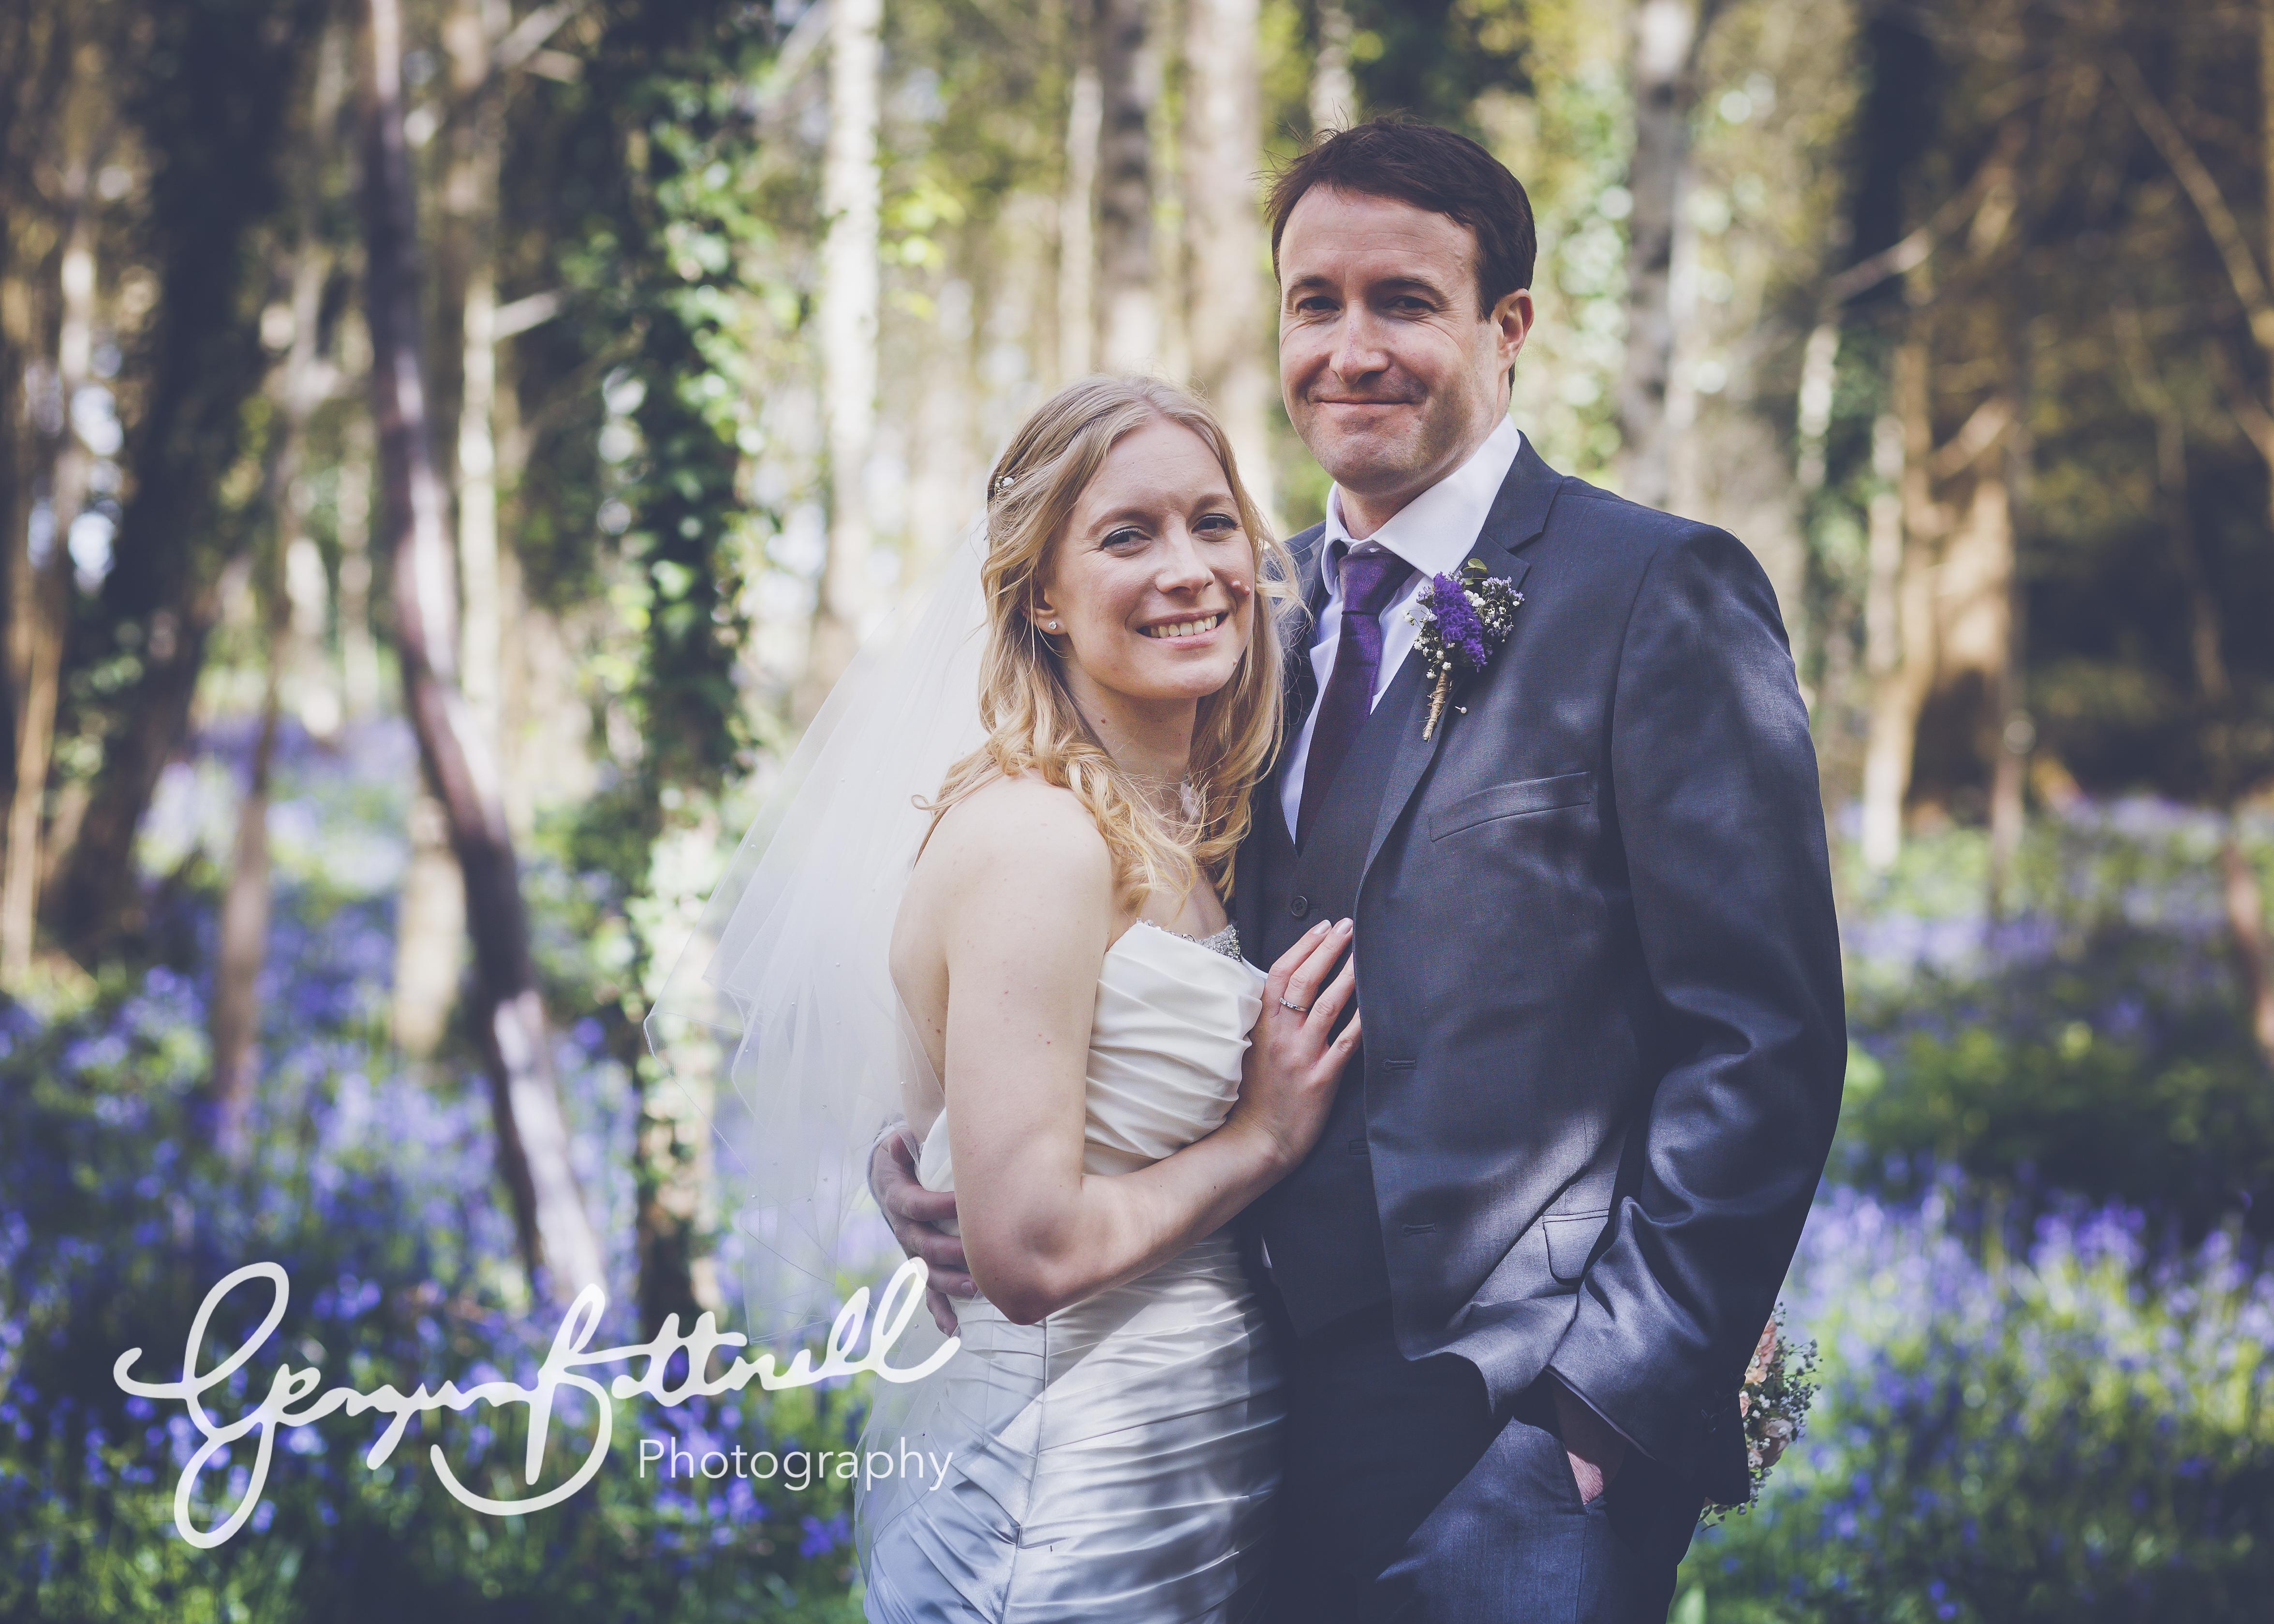 isle of wight wedding photography